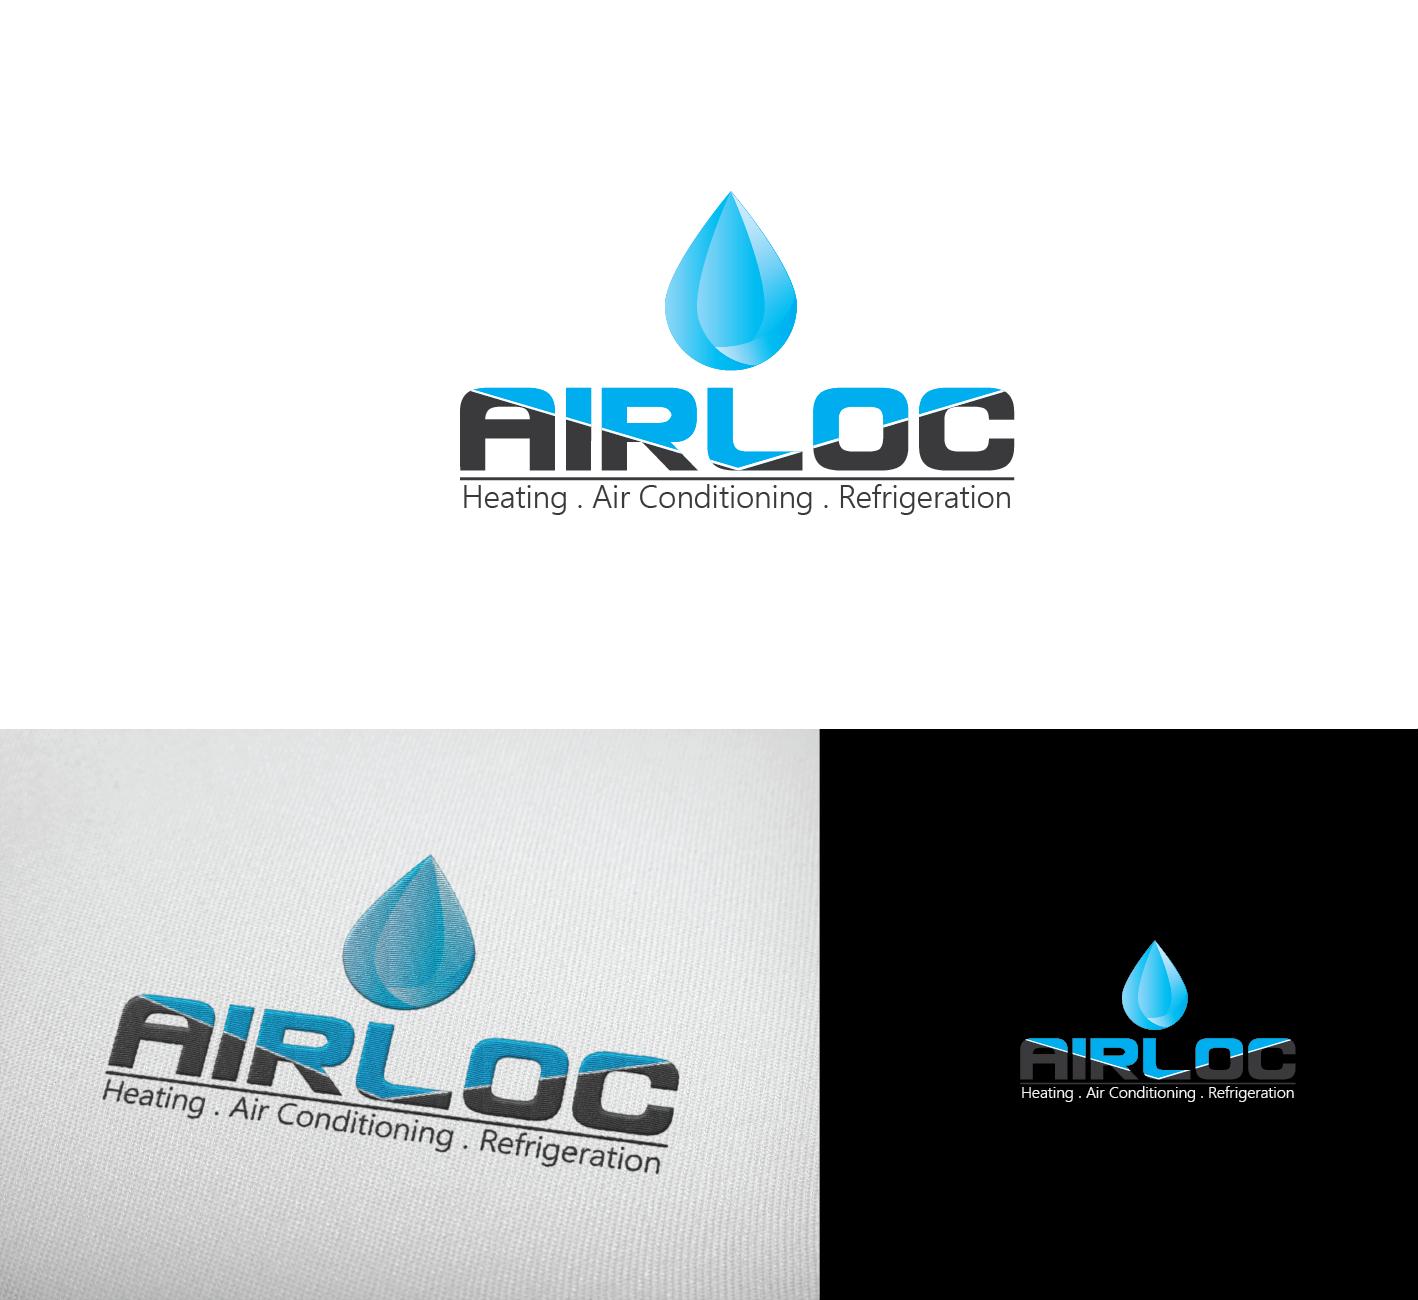 Logo Design by Private User - Entry No. 116 in the Logo Design Contest Airloc Logo Design.